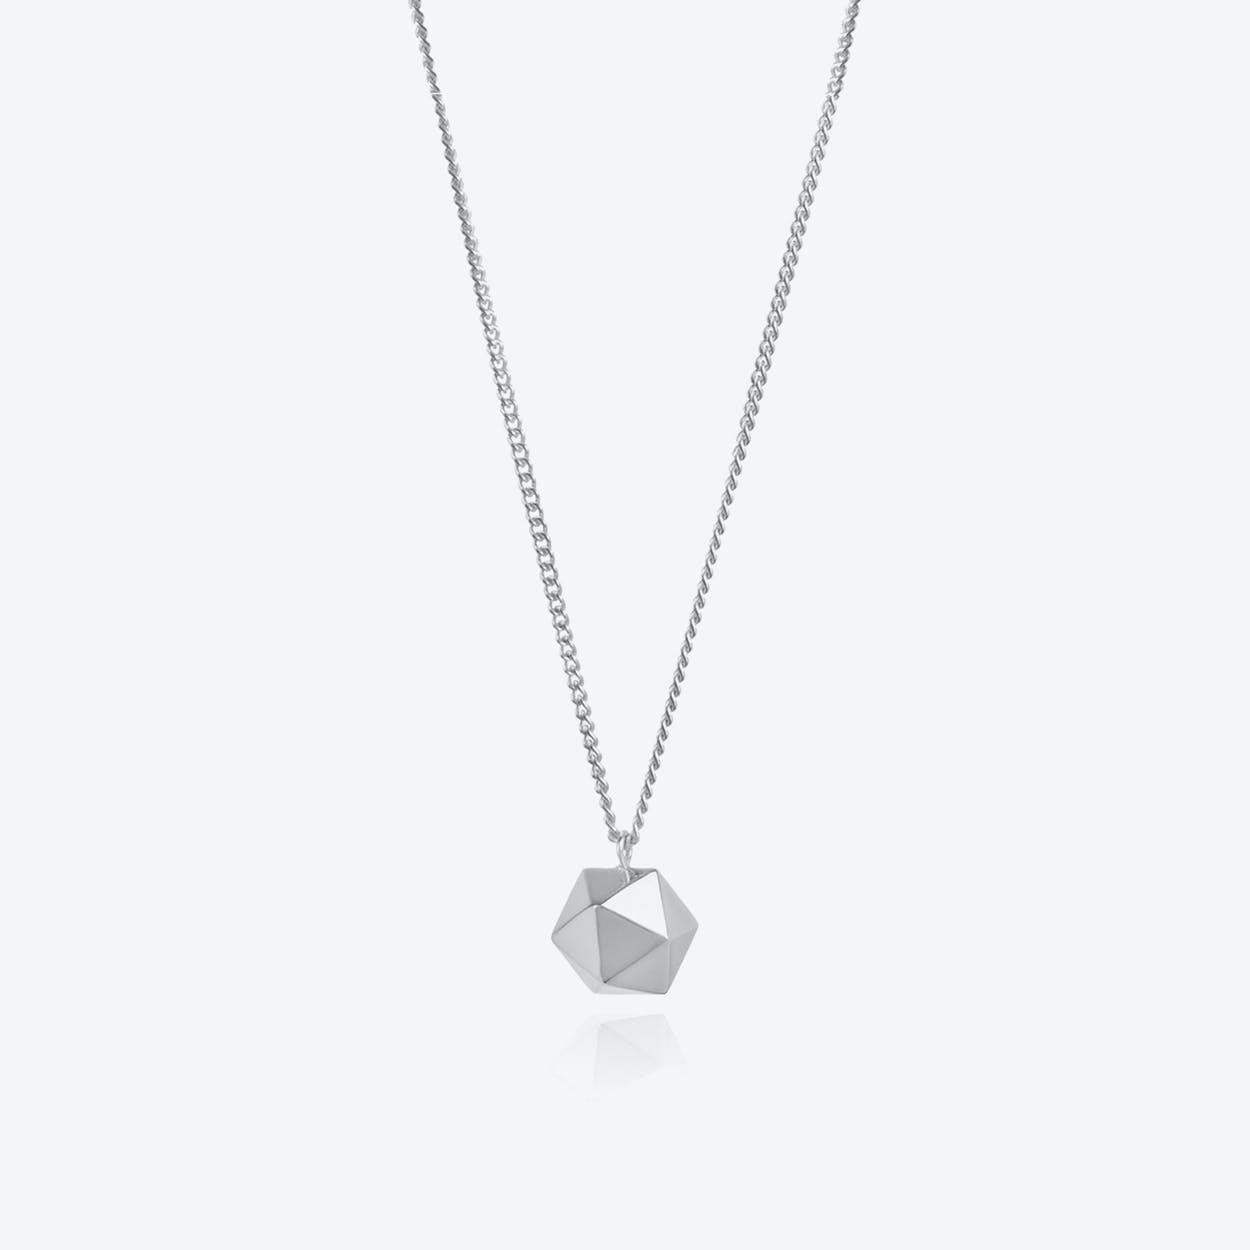 Icosahedron Pendant in Silver